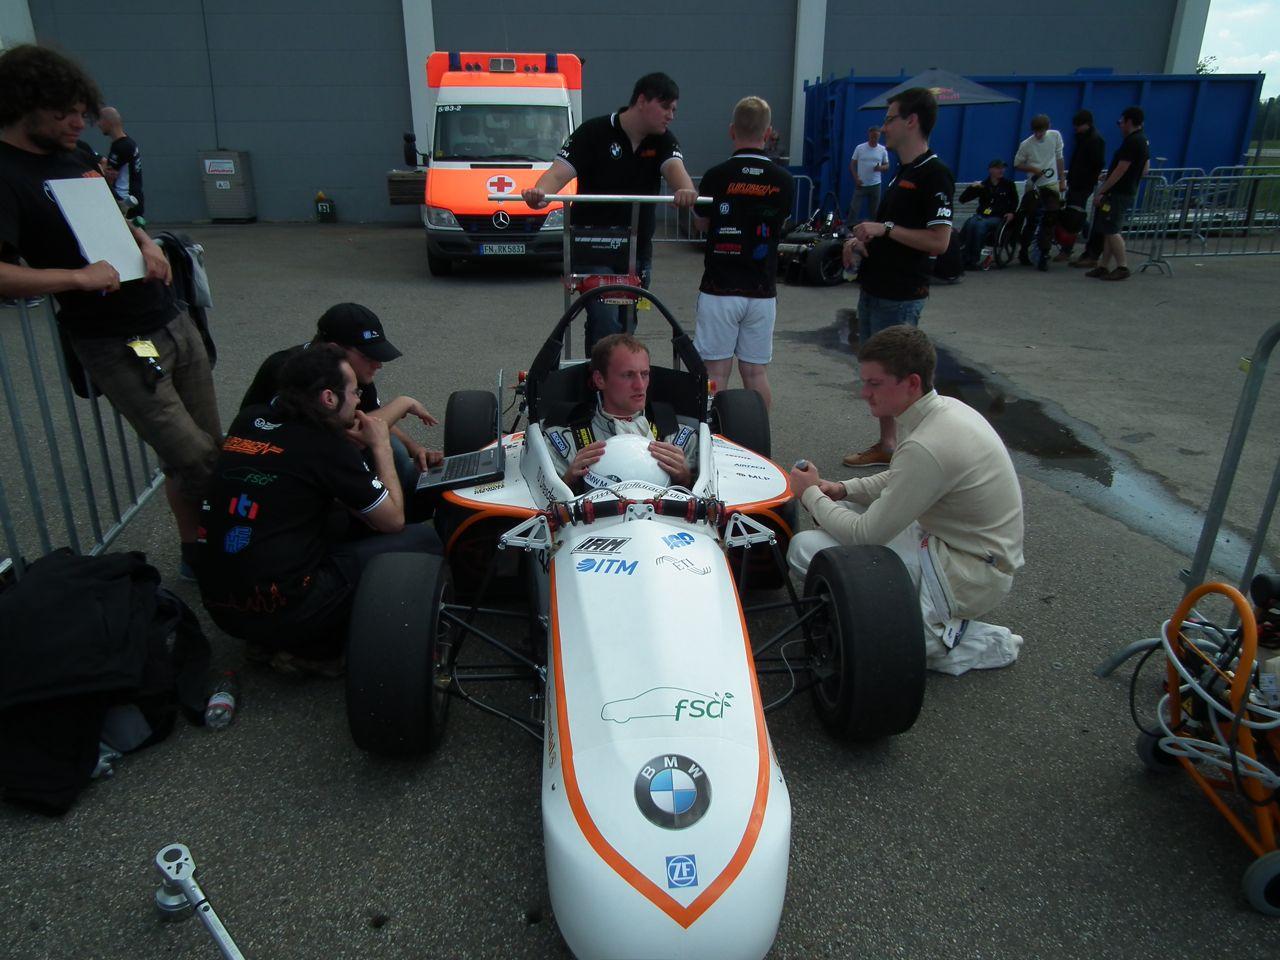 zf_racecamp_201135